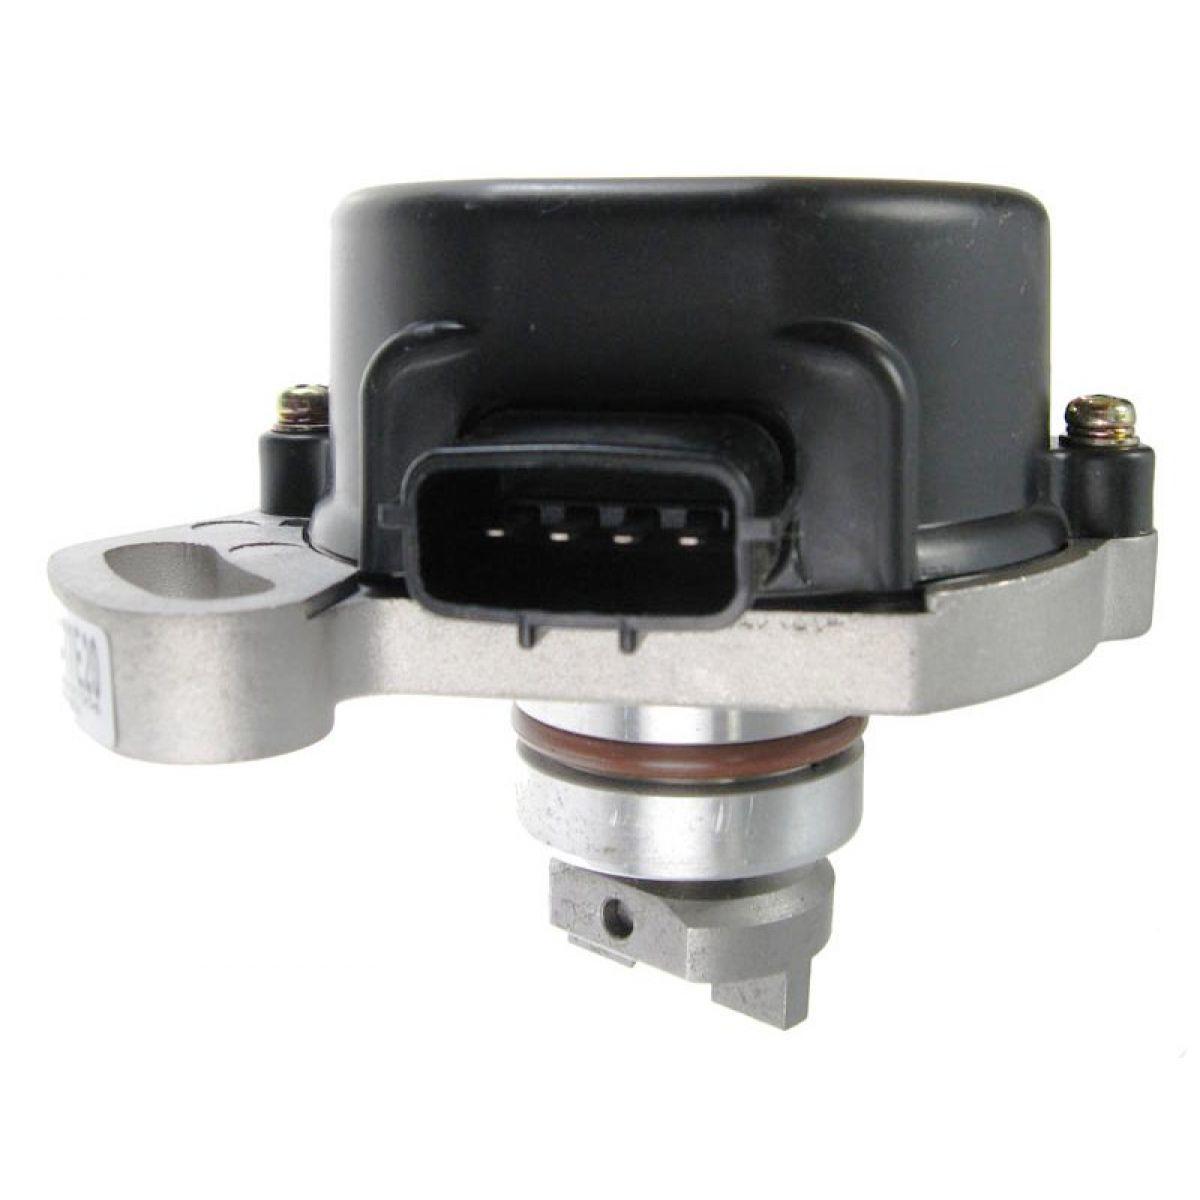 Camshaft Cam Shaft Position Sensor Synchronizer For Suzuki